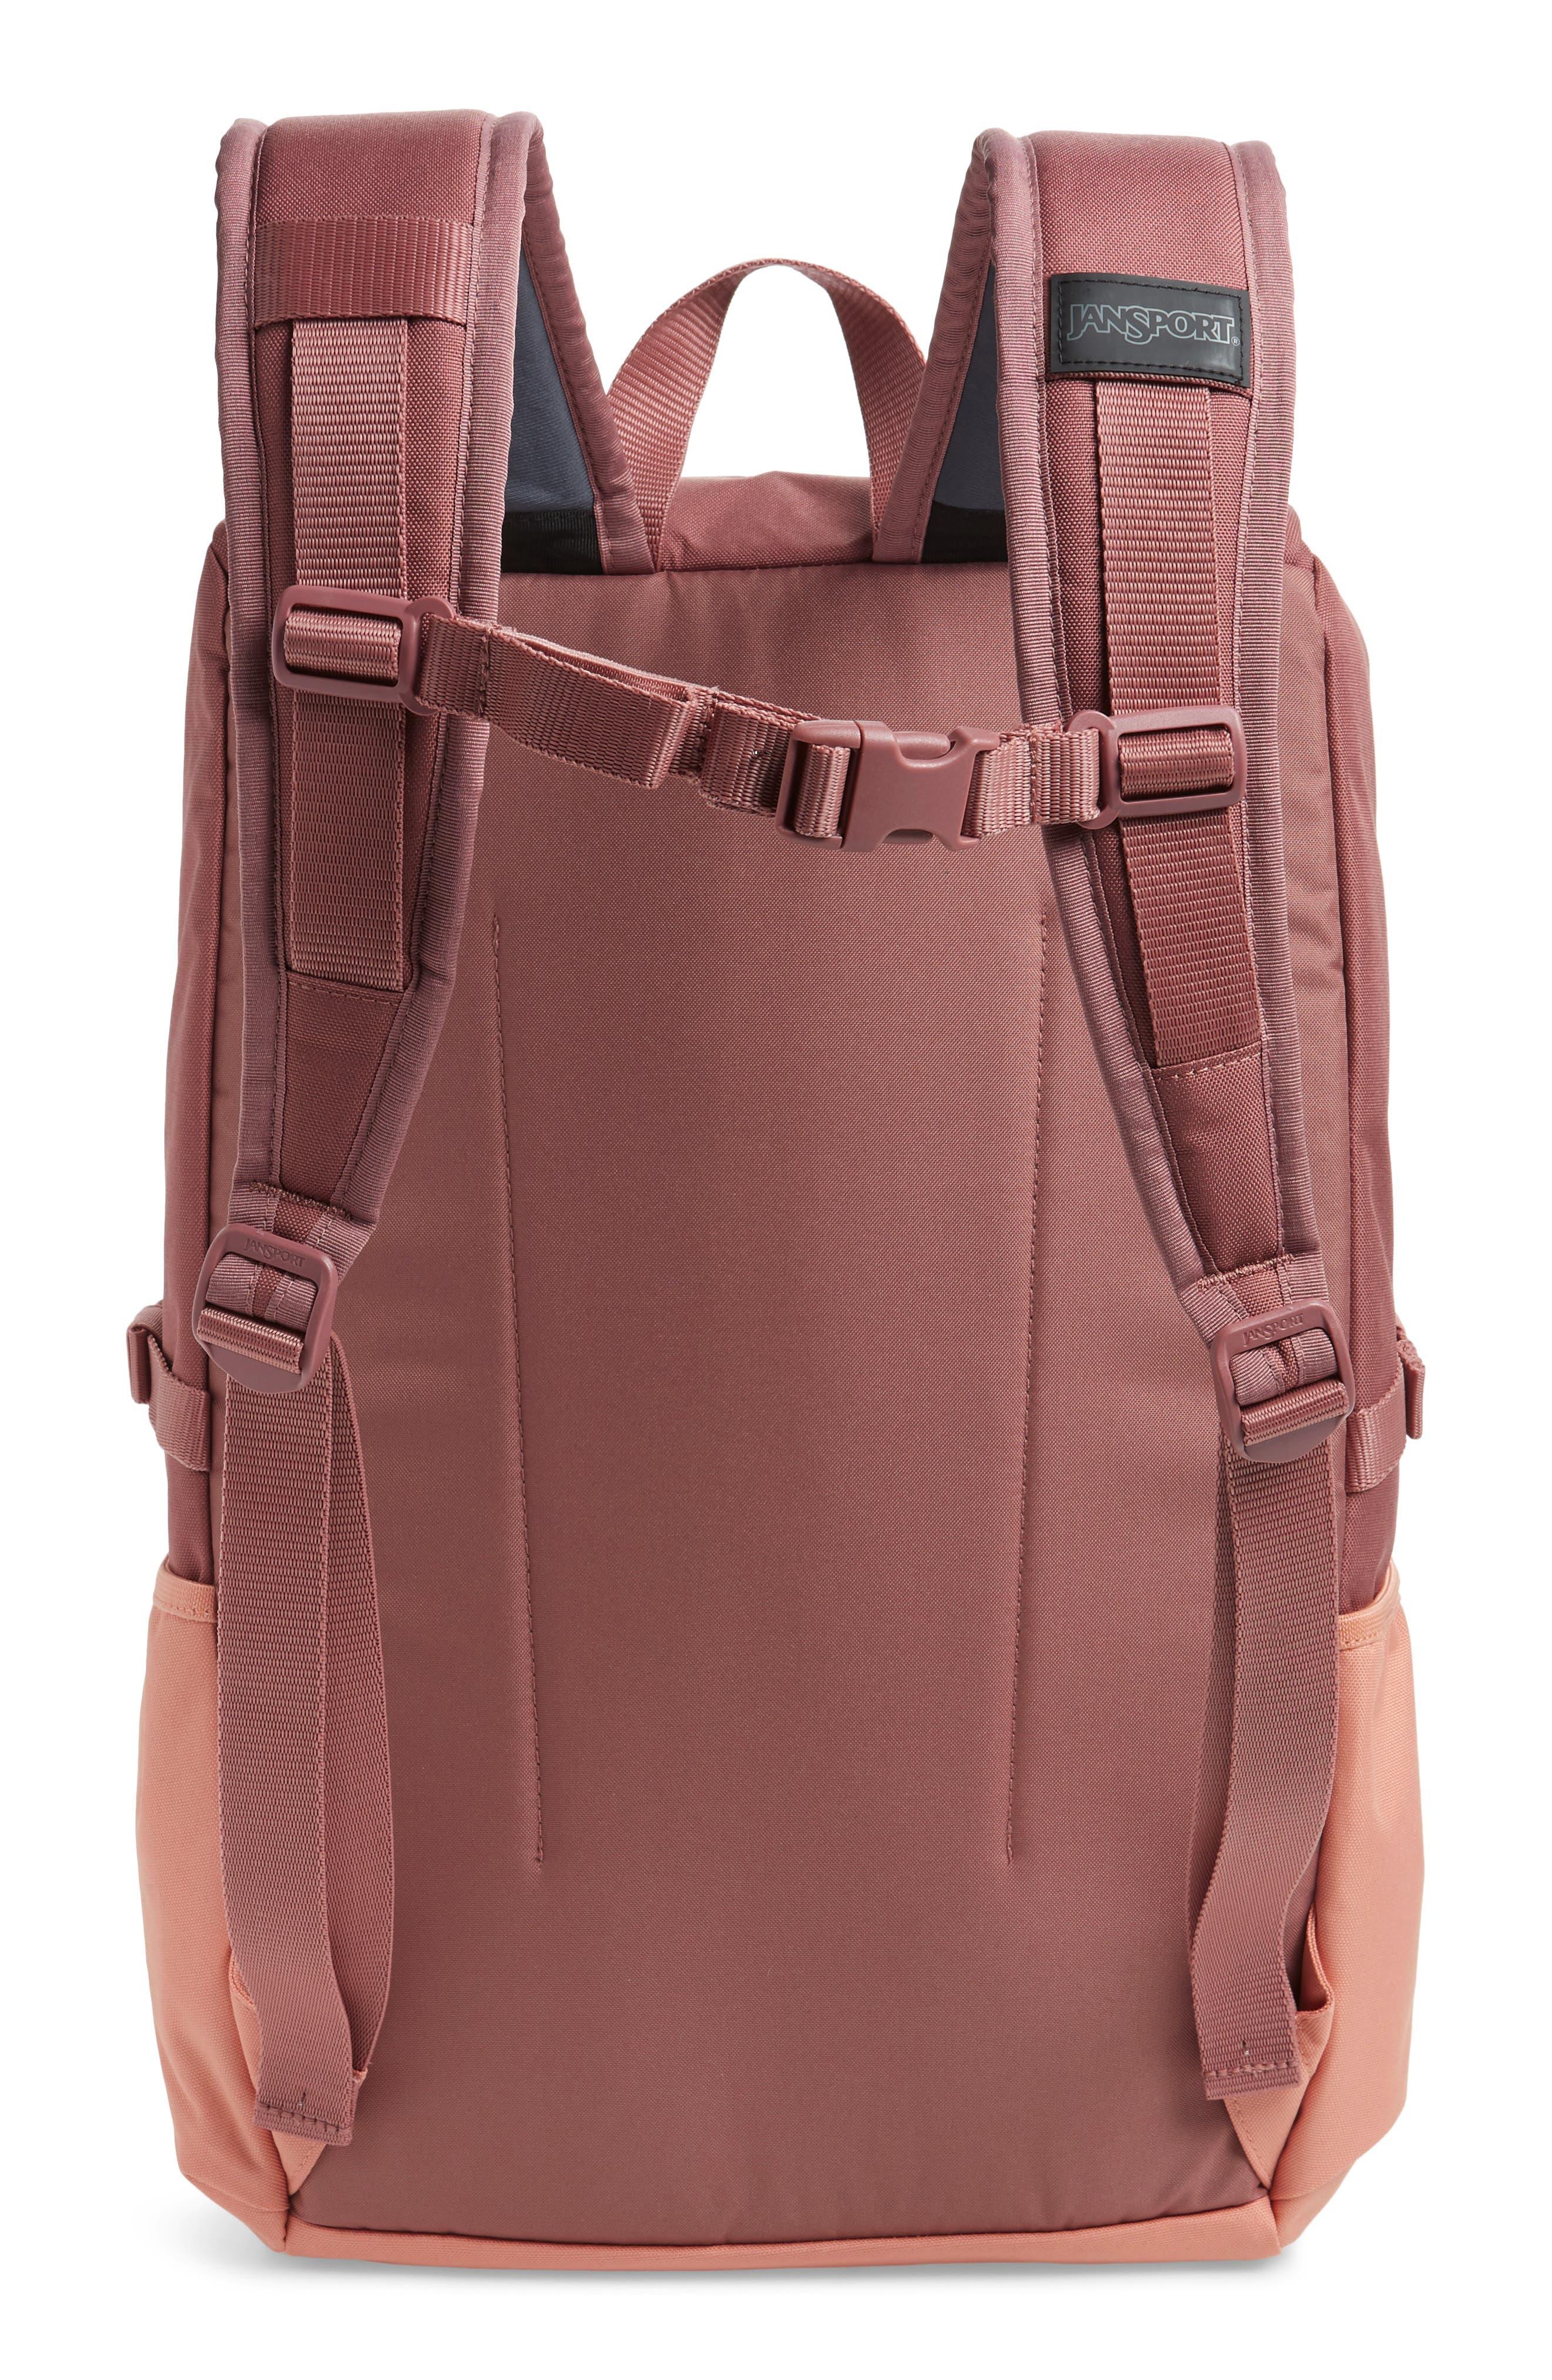 JANSPORT, Hatchet Backpack, Alternate thumbnail 4, color, MOCHA/ CLAY